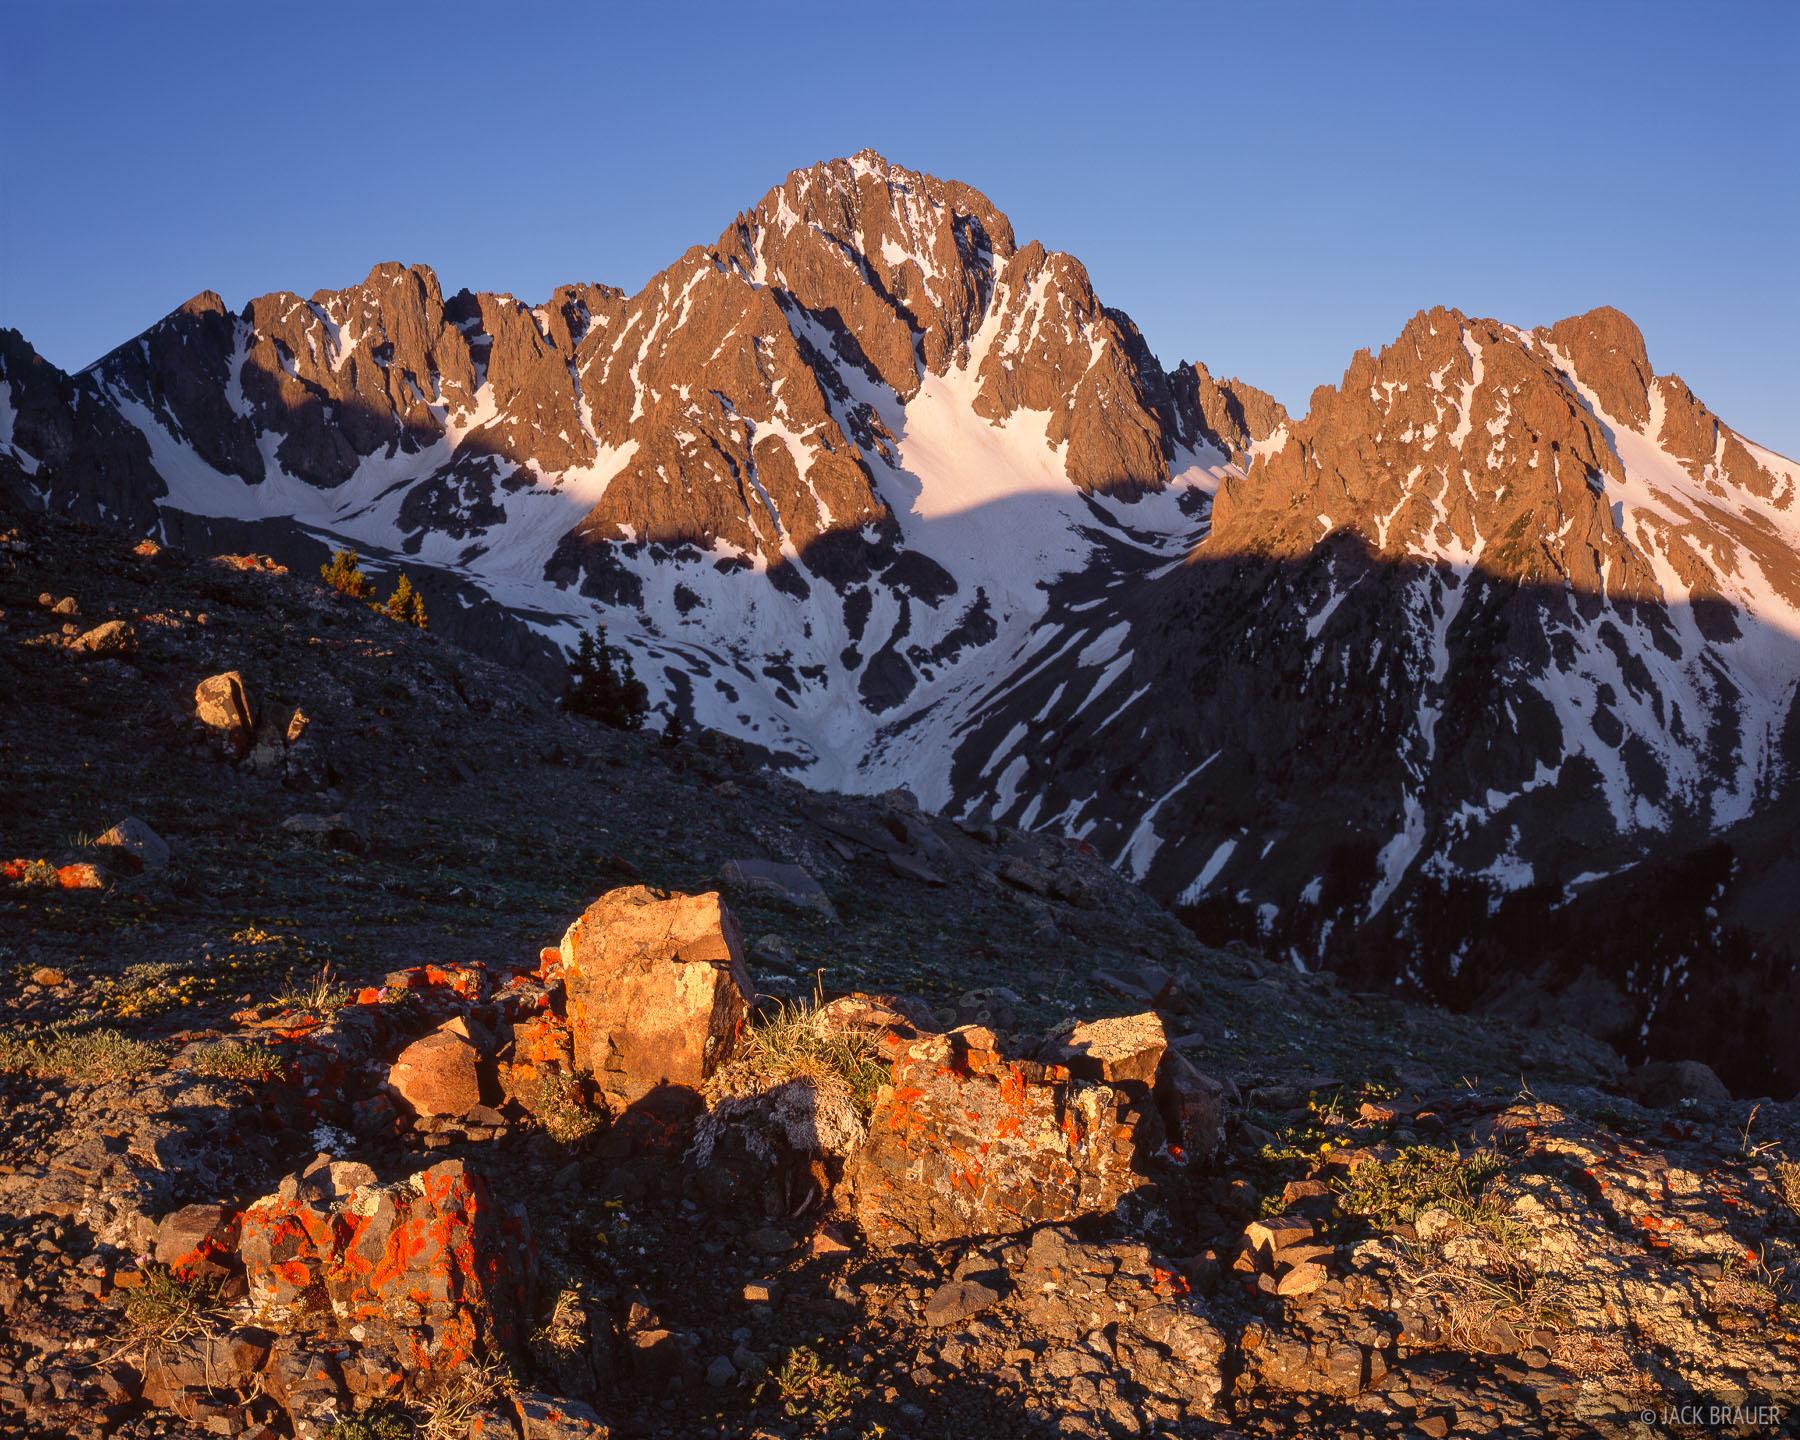 Mt. Sneffels, San Juan Mountains, Colorado, fourteeners, photo